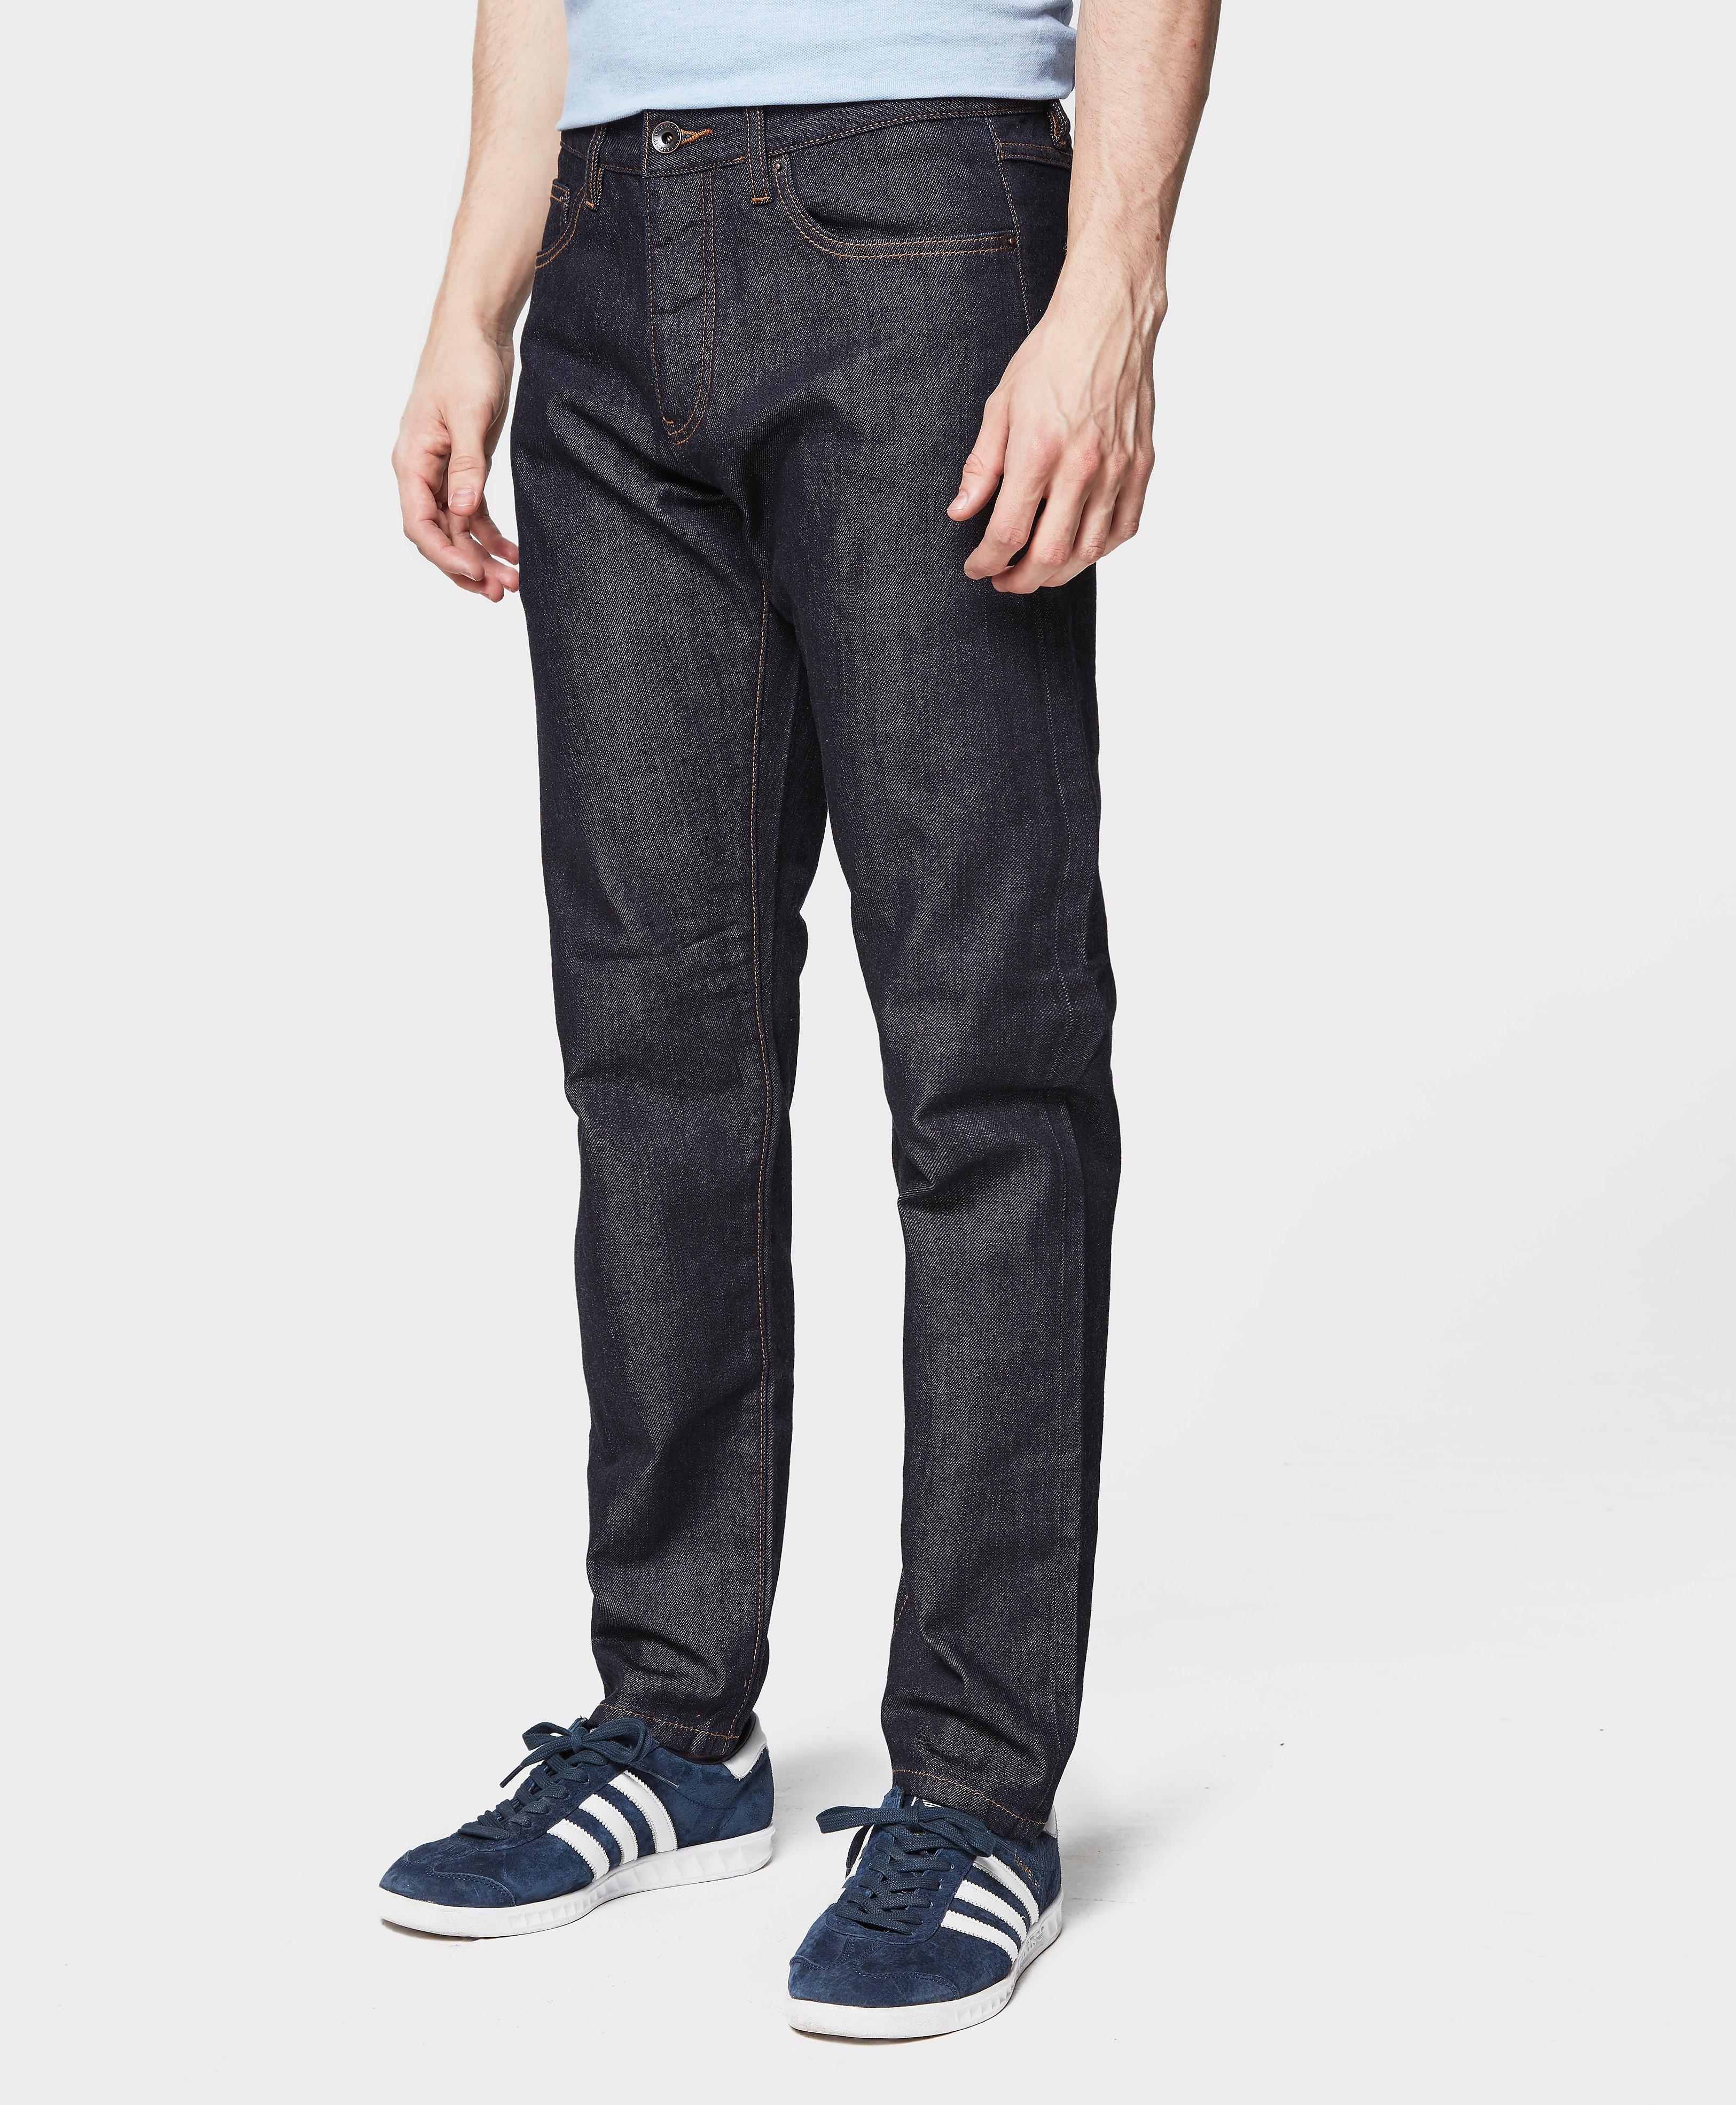 Lyle & Scott Slim 5 Pocket Jean